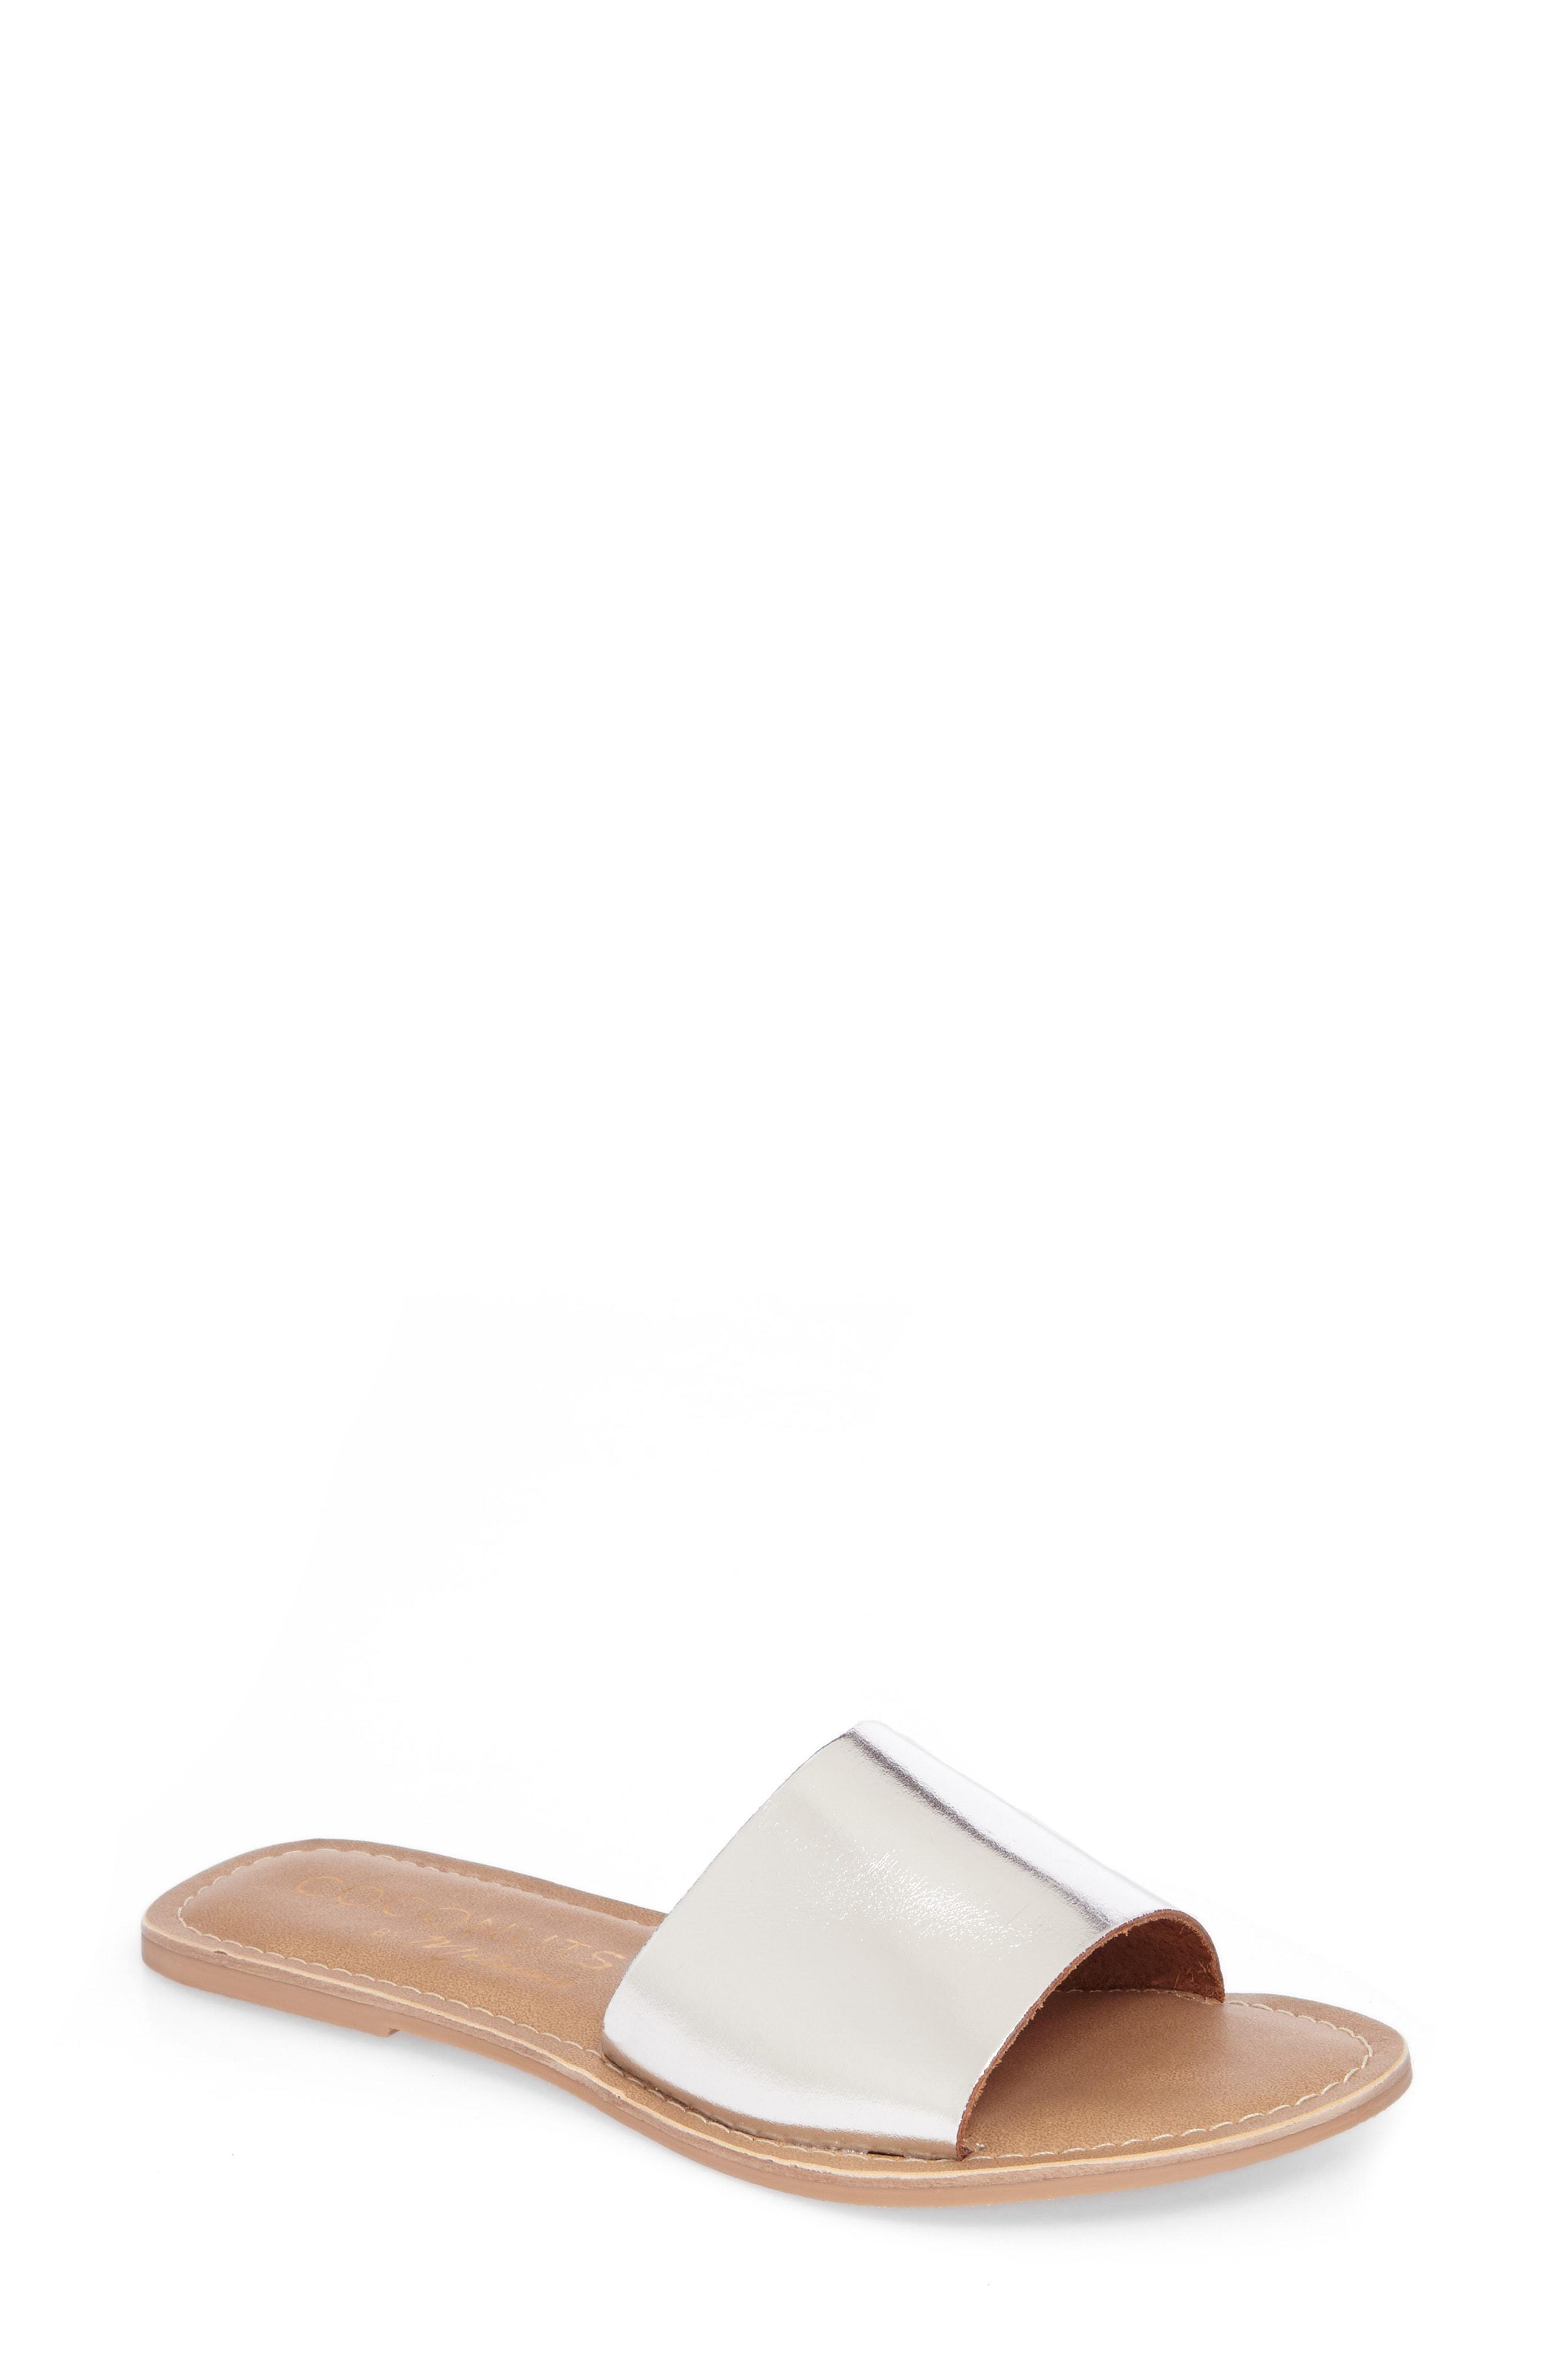 e8df3b7a981265 Lyst - Matisse Cabana Slide Sandal in Metallic